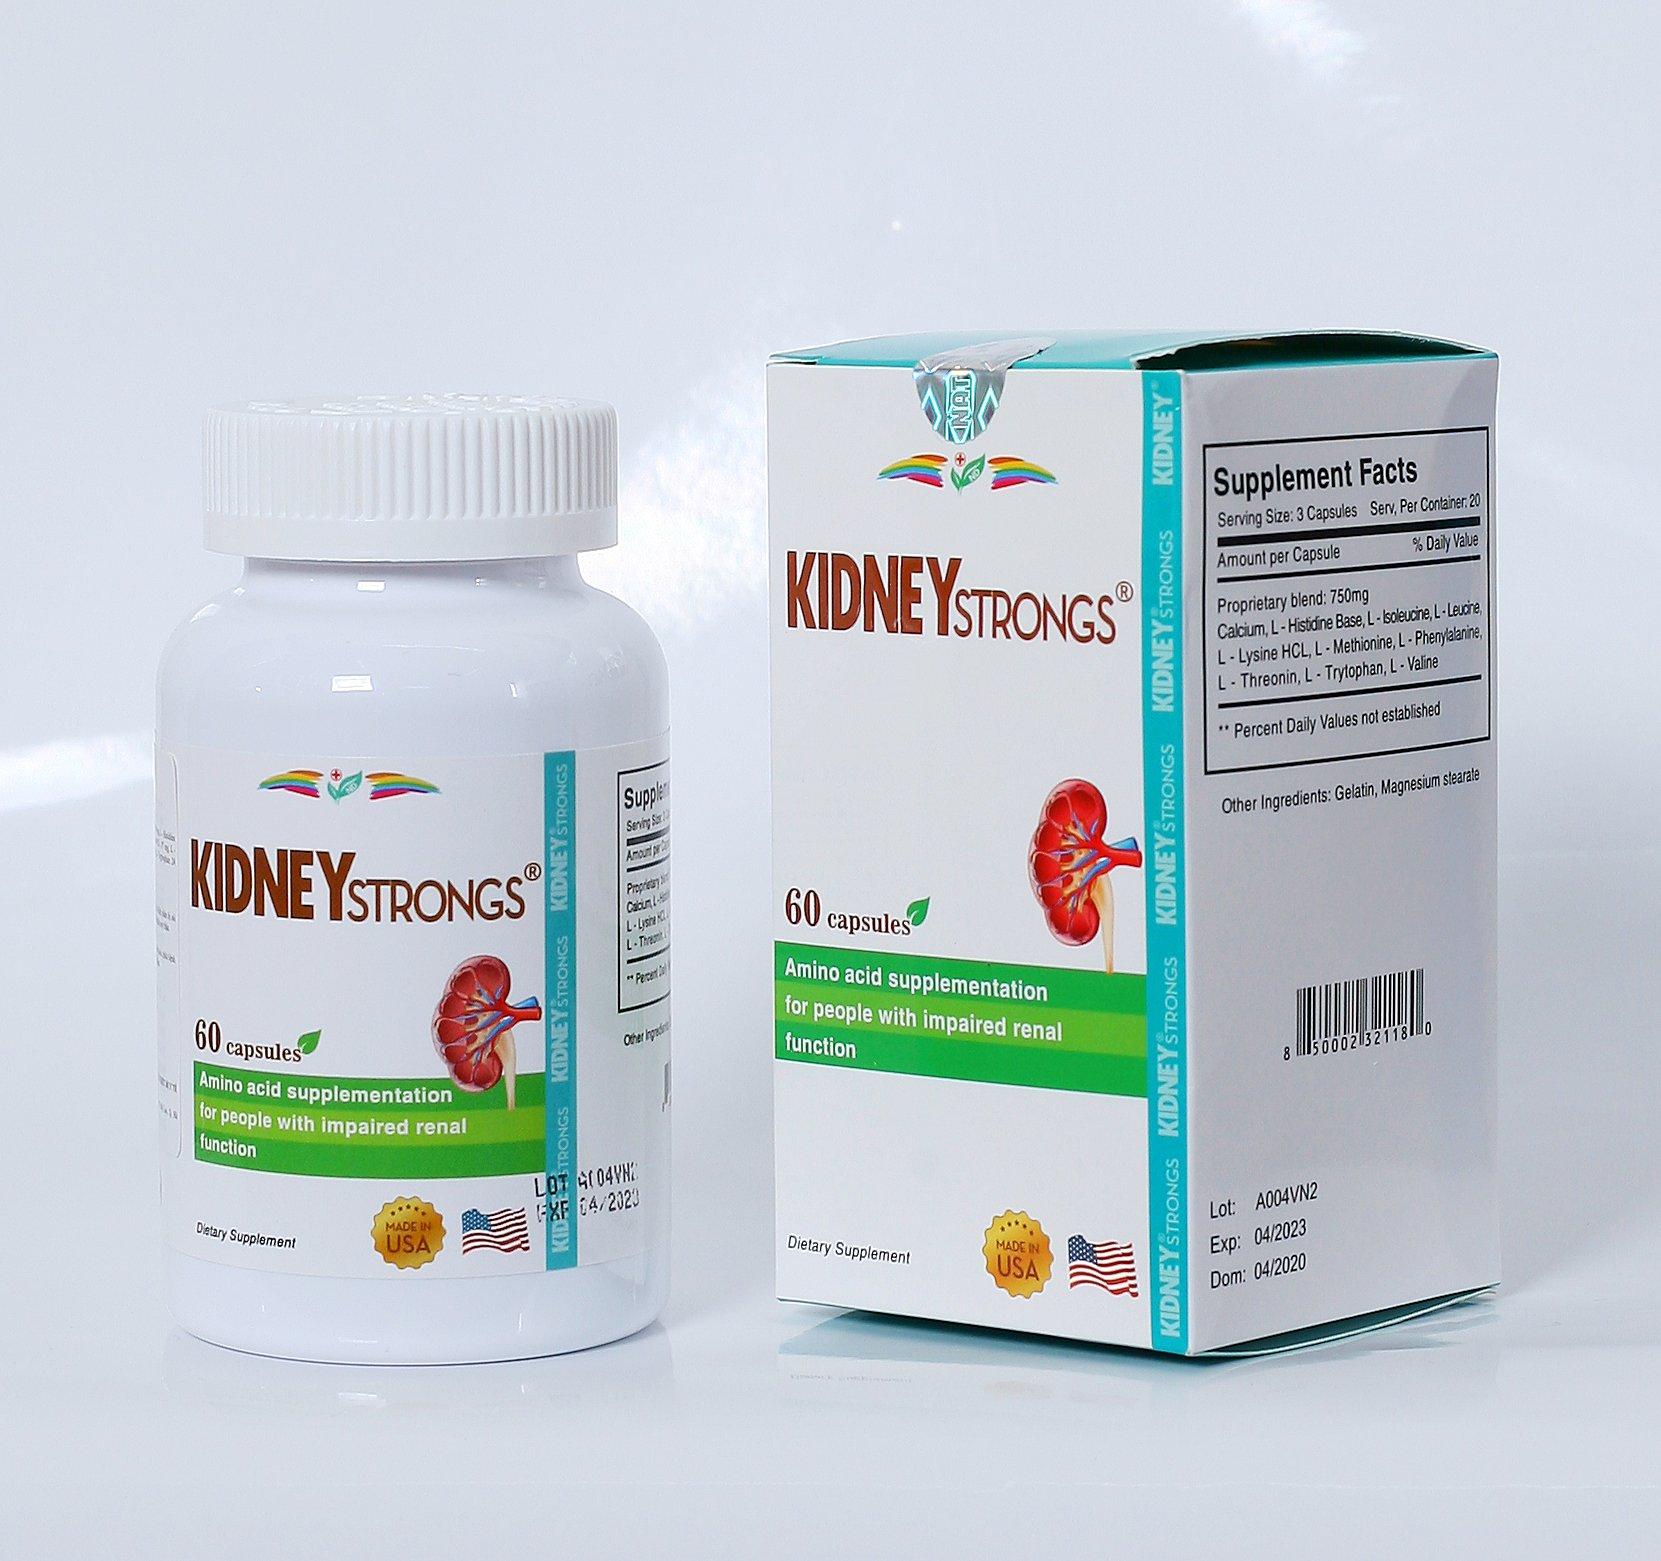 Kidney Strongs